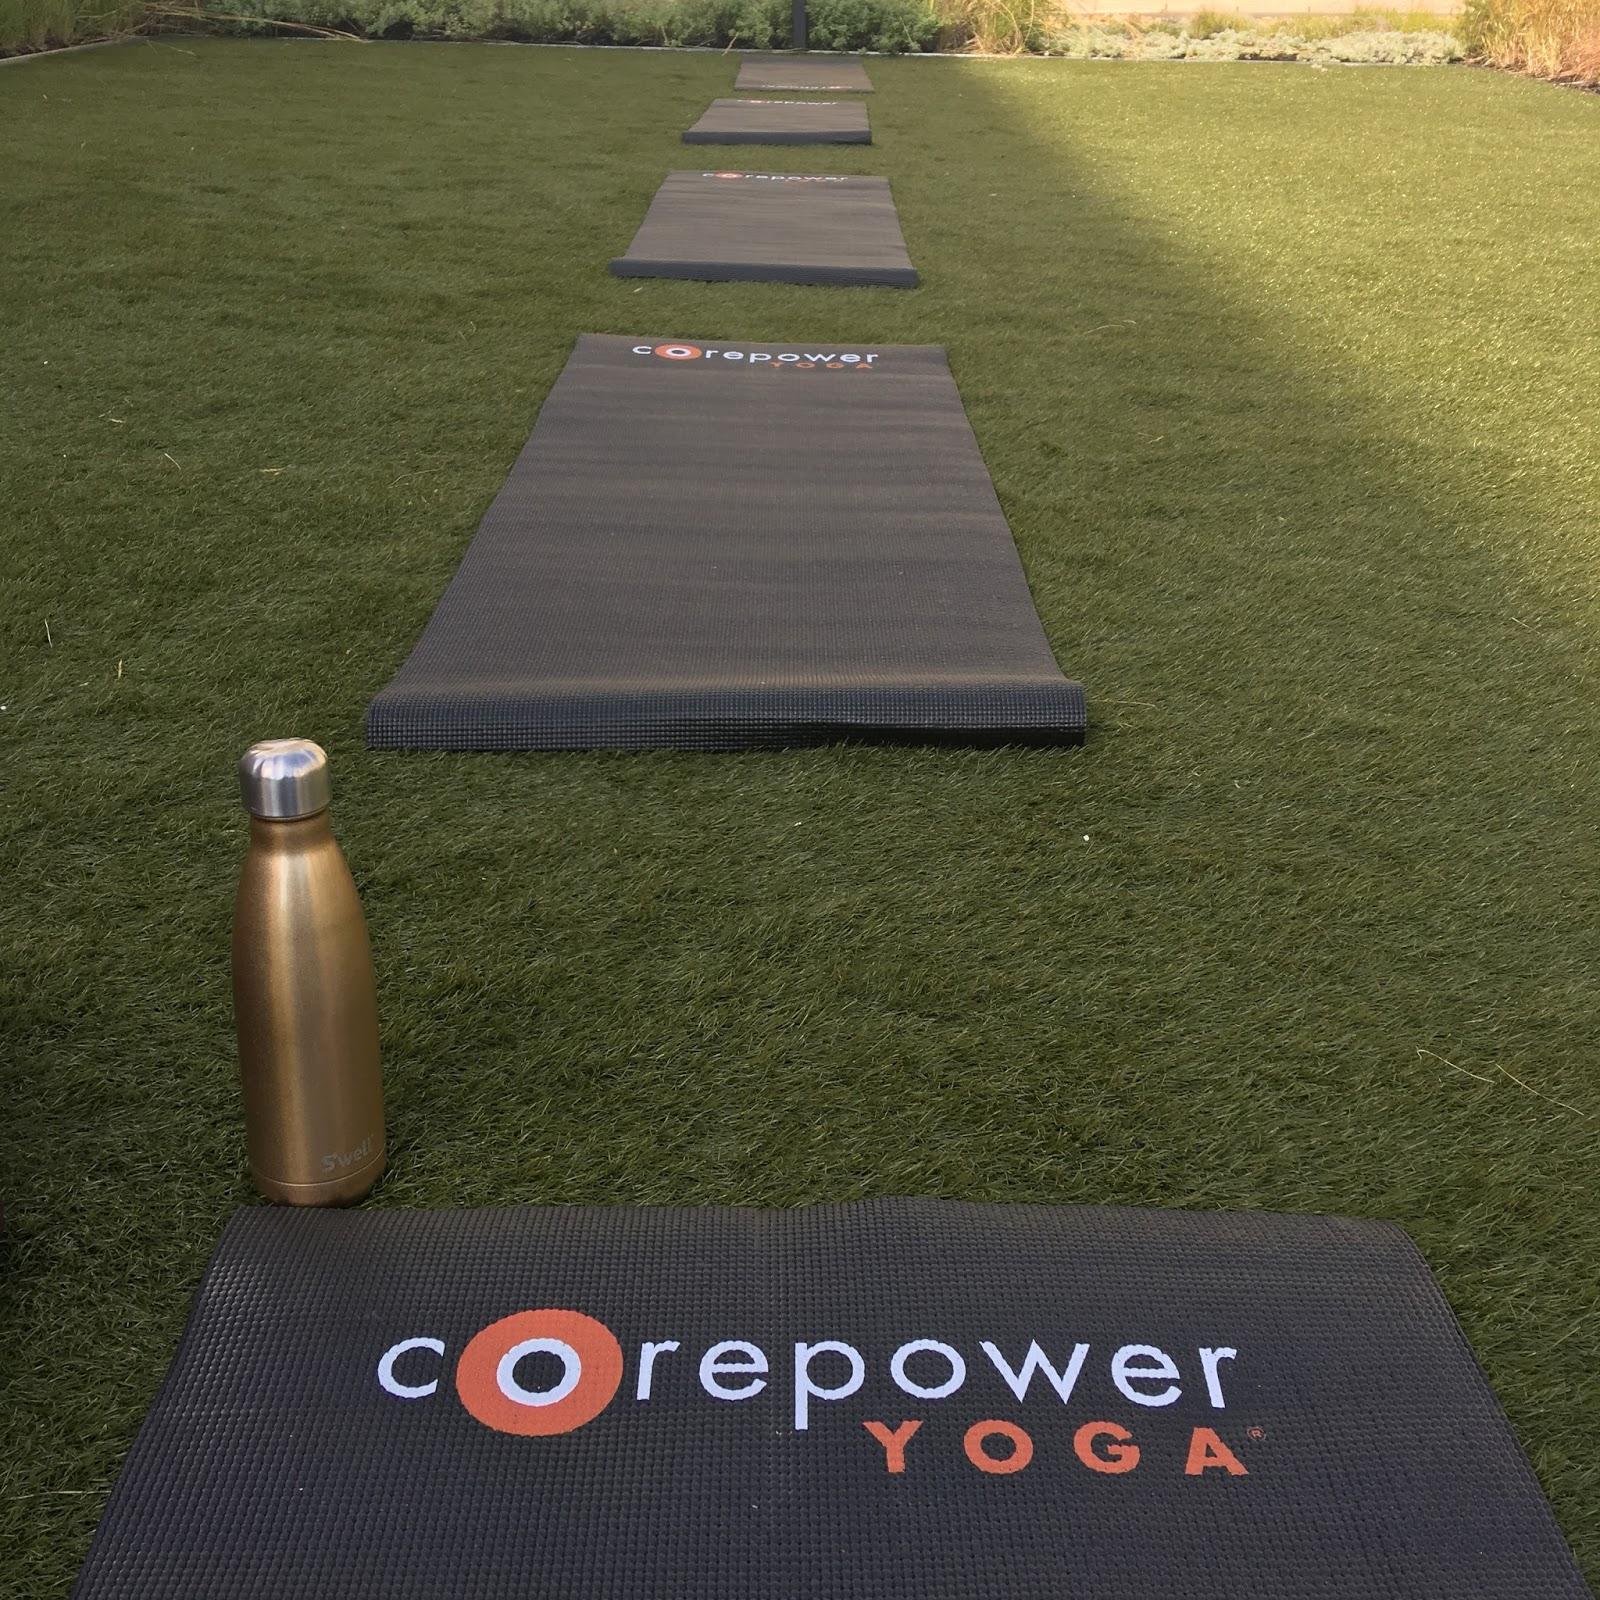 Core Power Yoga Ink Block